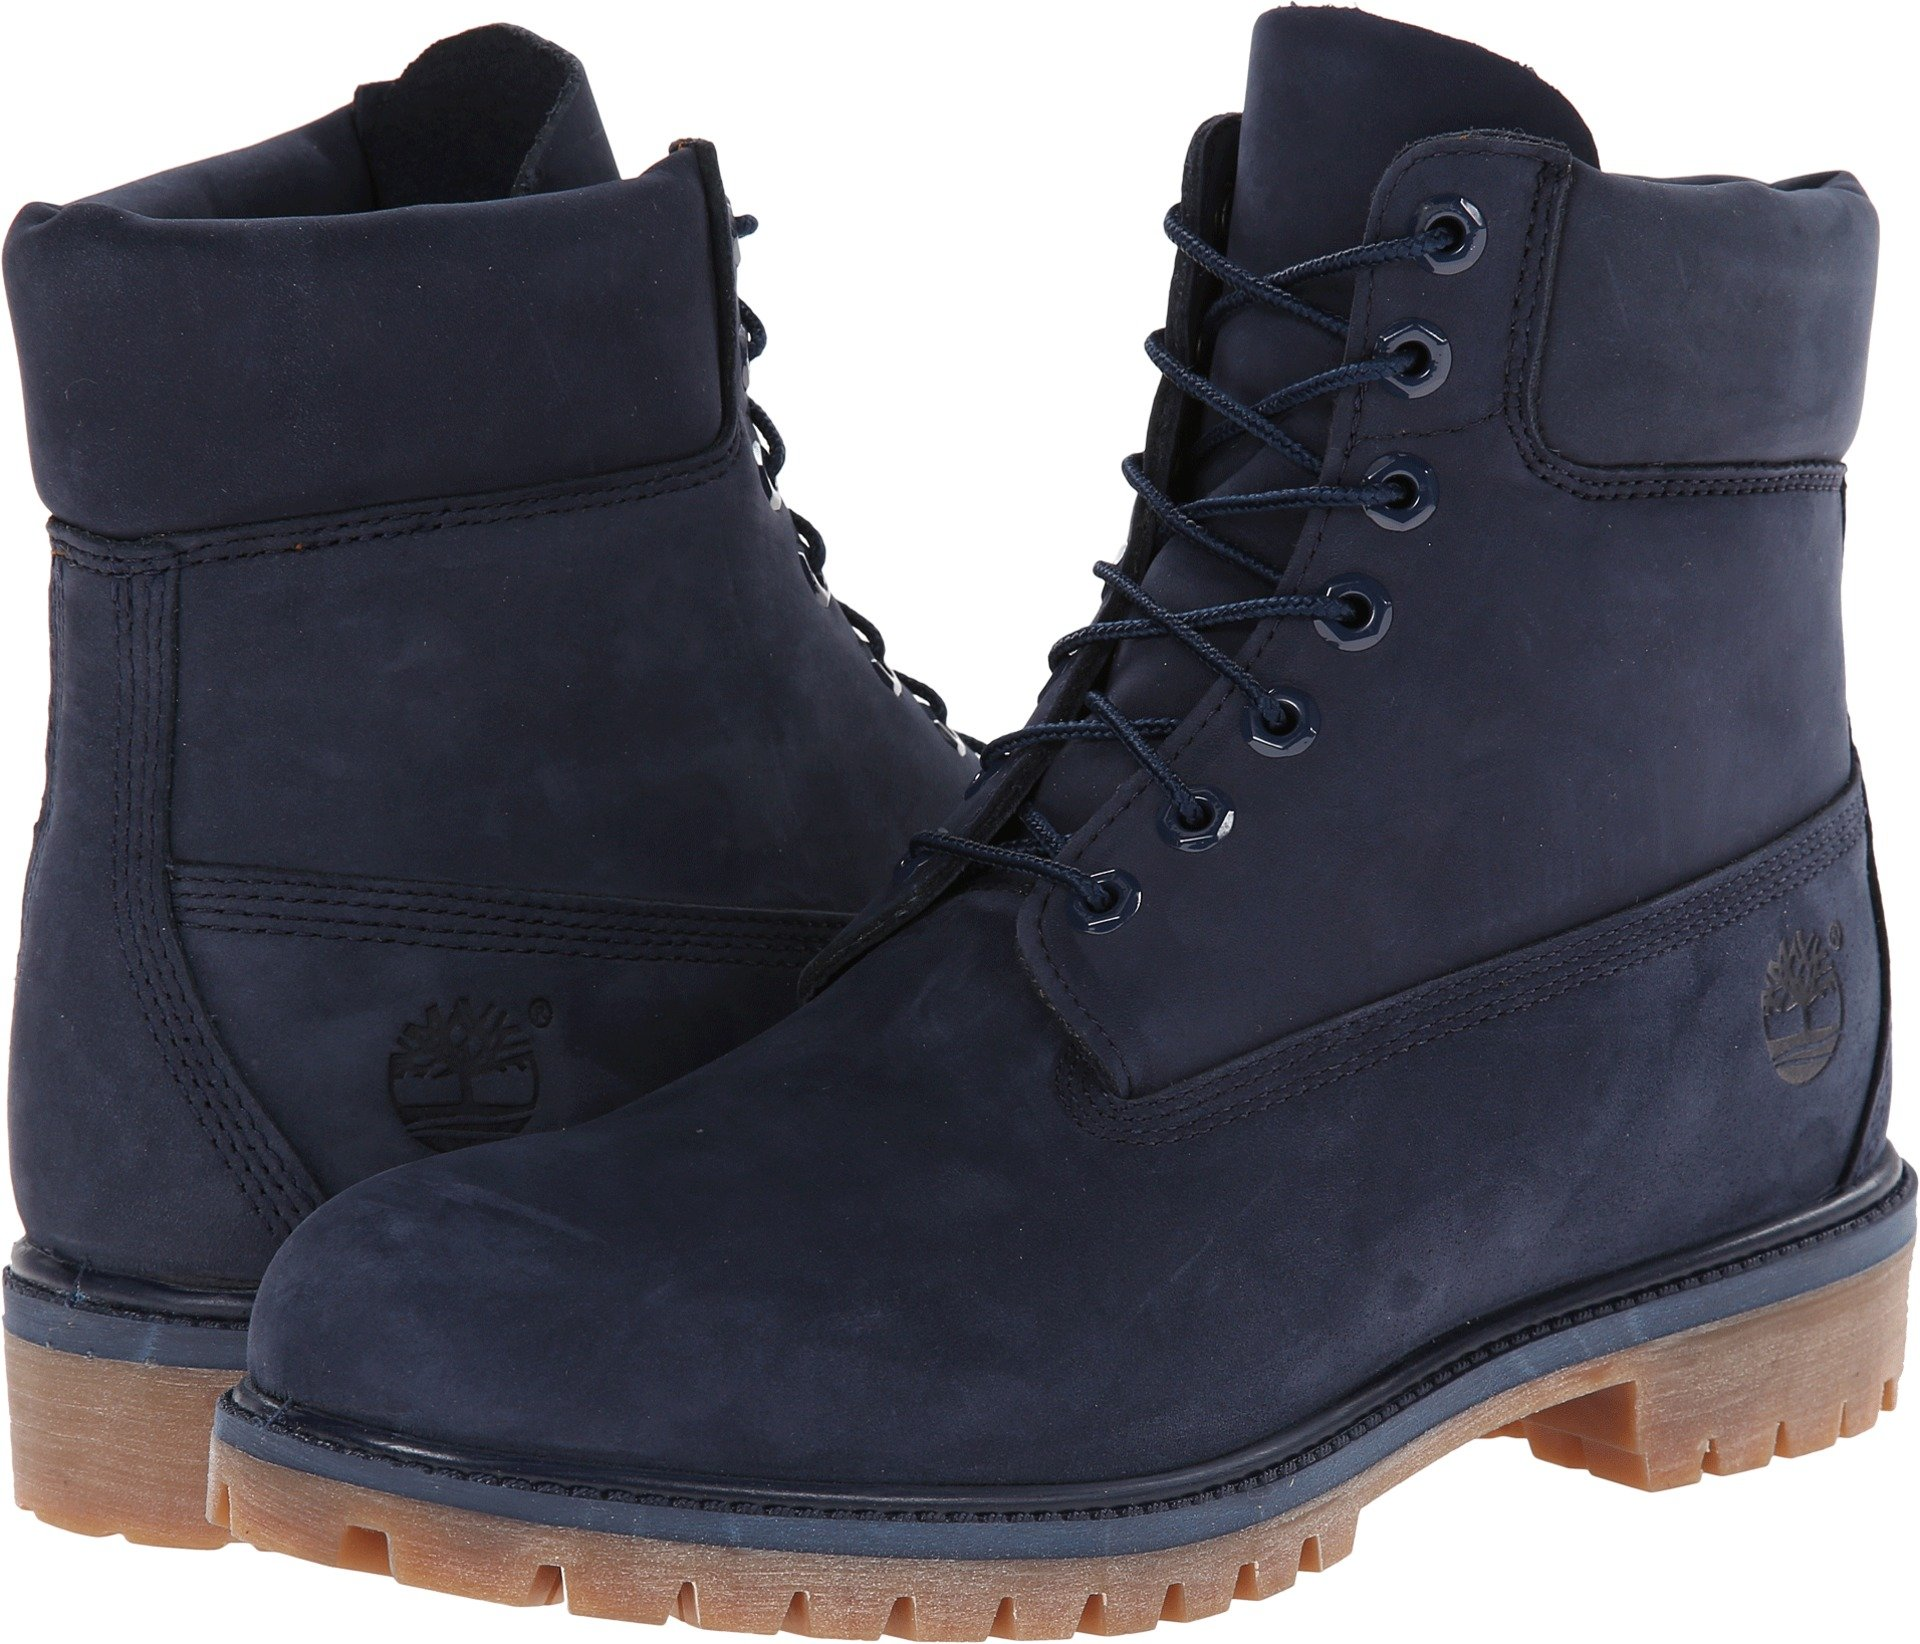 Timberland Men's 6'' Premium Boot Navy Monochrome 7 EE US